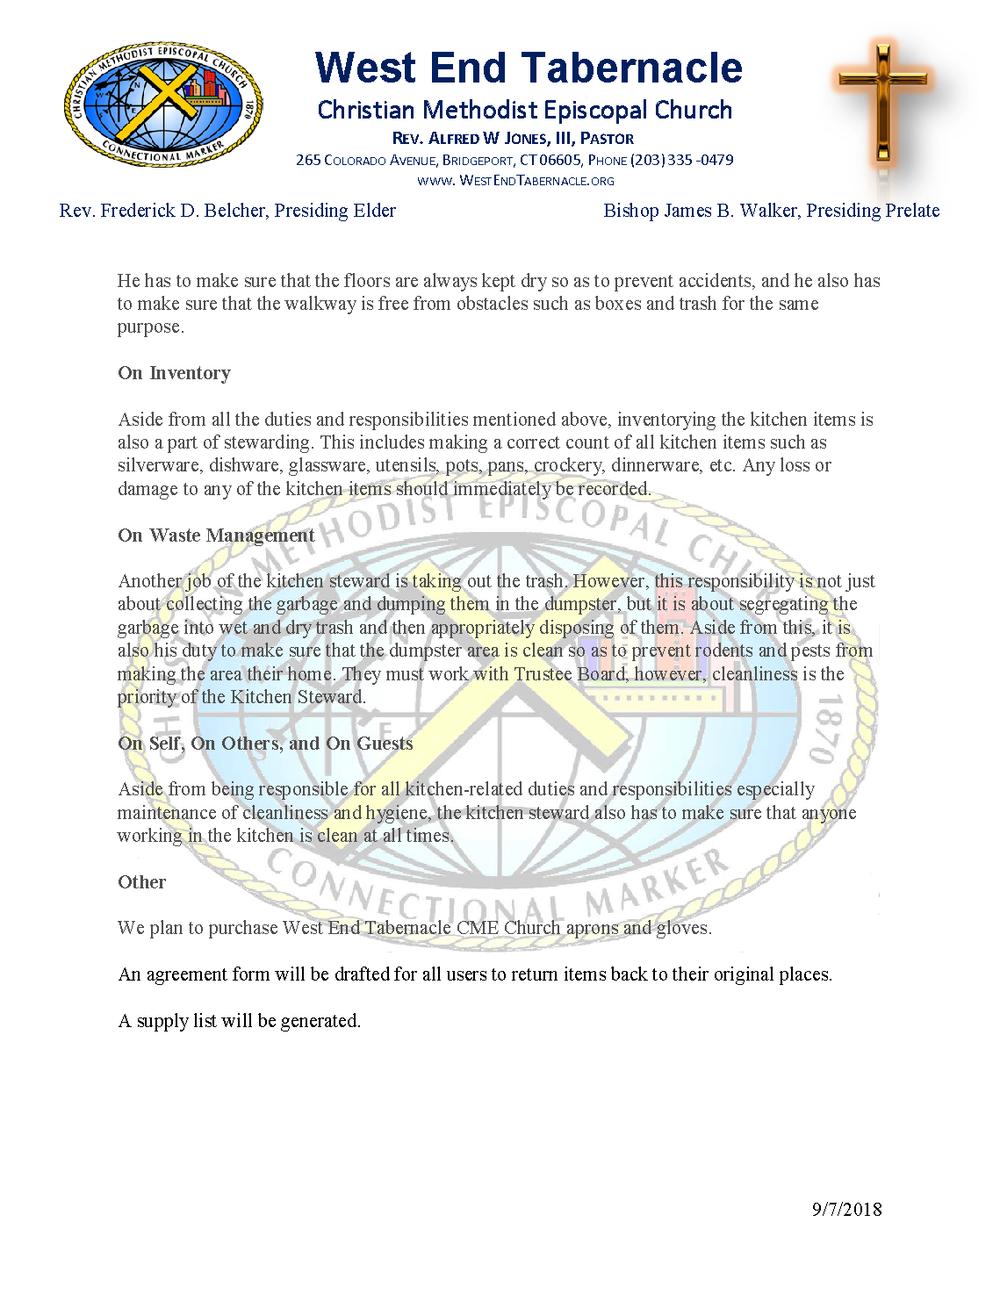 Kitchen Steward Summary_Page_2.png